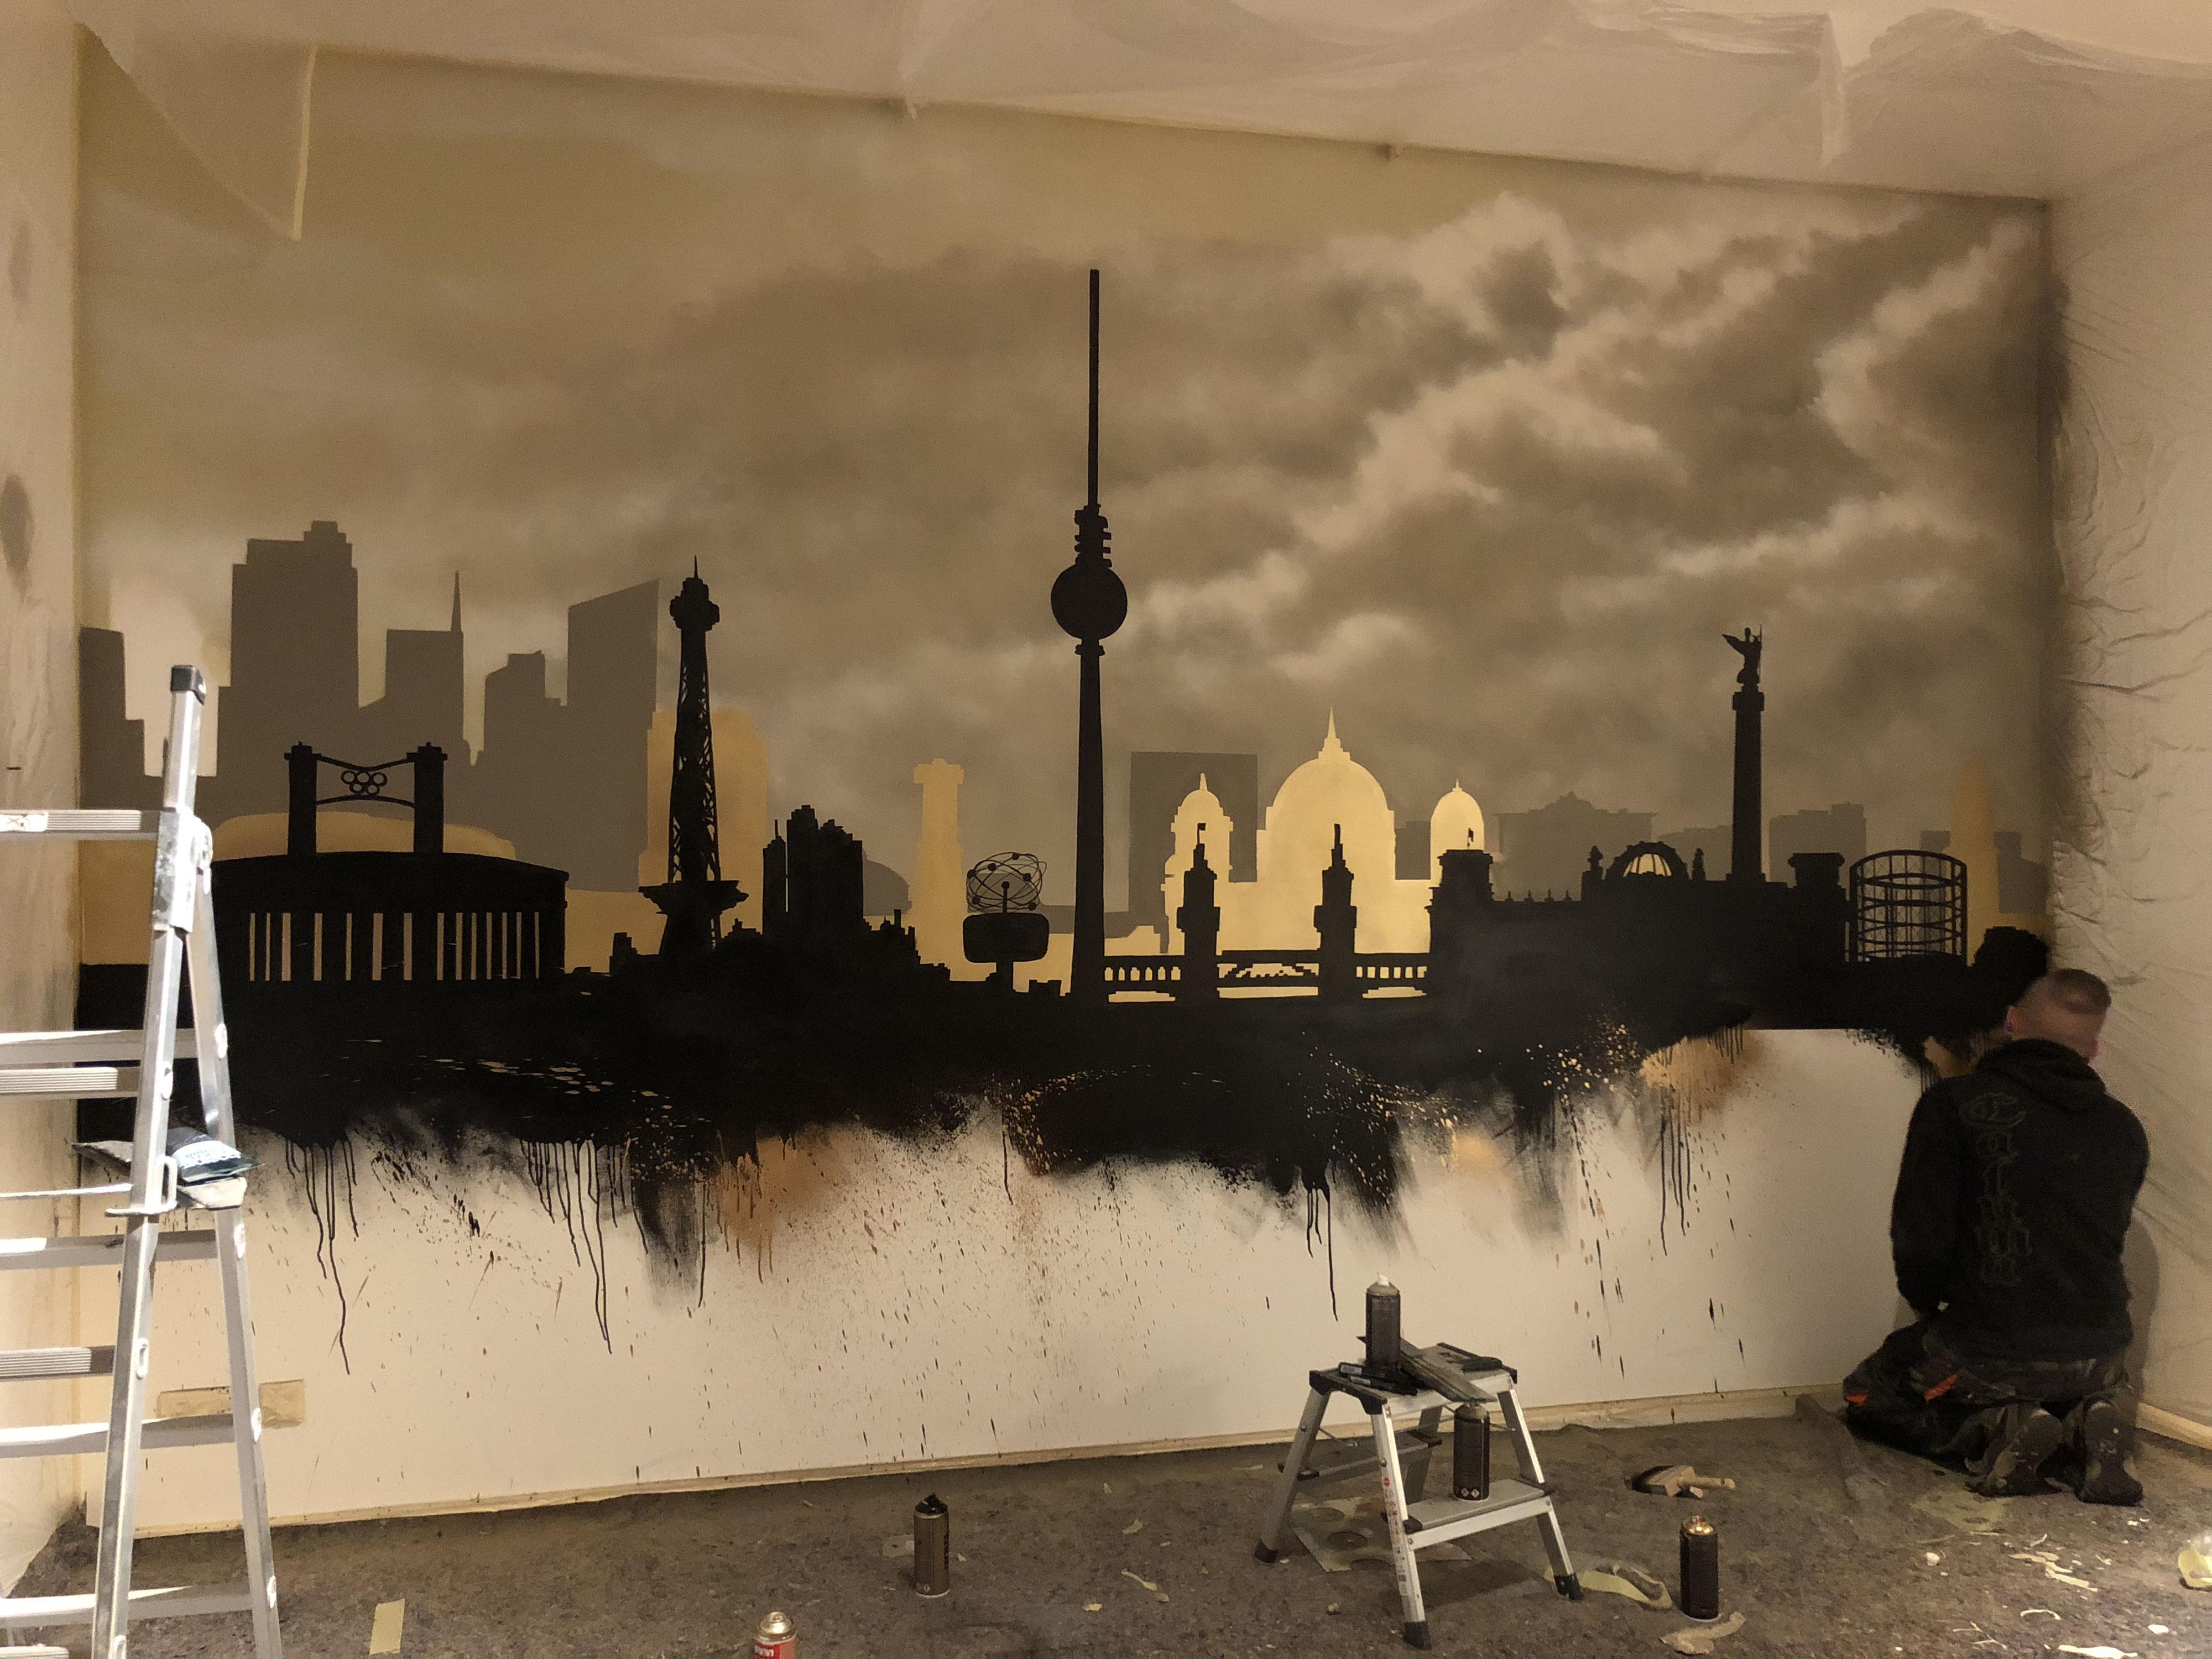 fassadenmalerei in berlin graffiti k nstler fassade. Black Bedroom Furniture Sets. Home Design Ideas